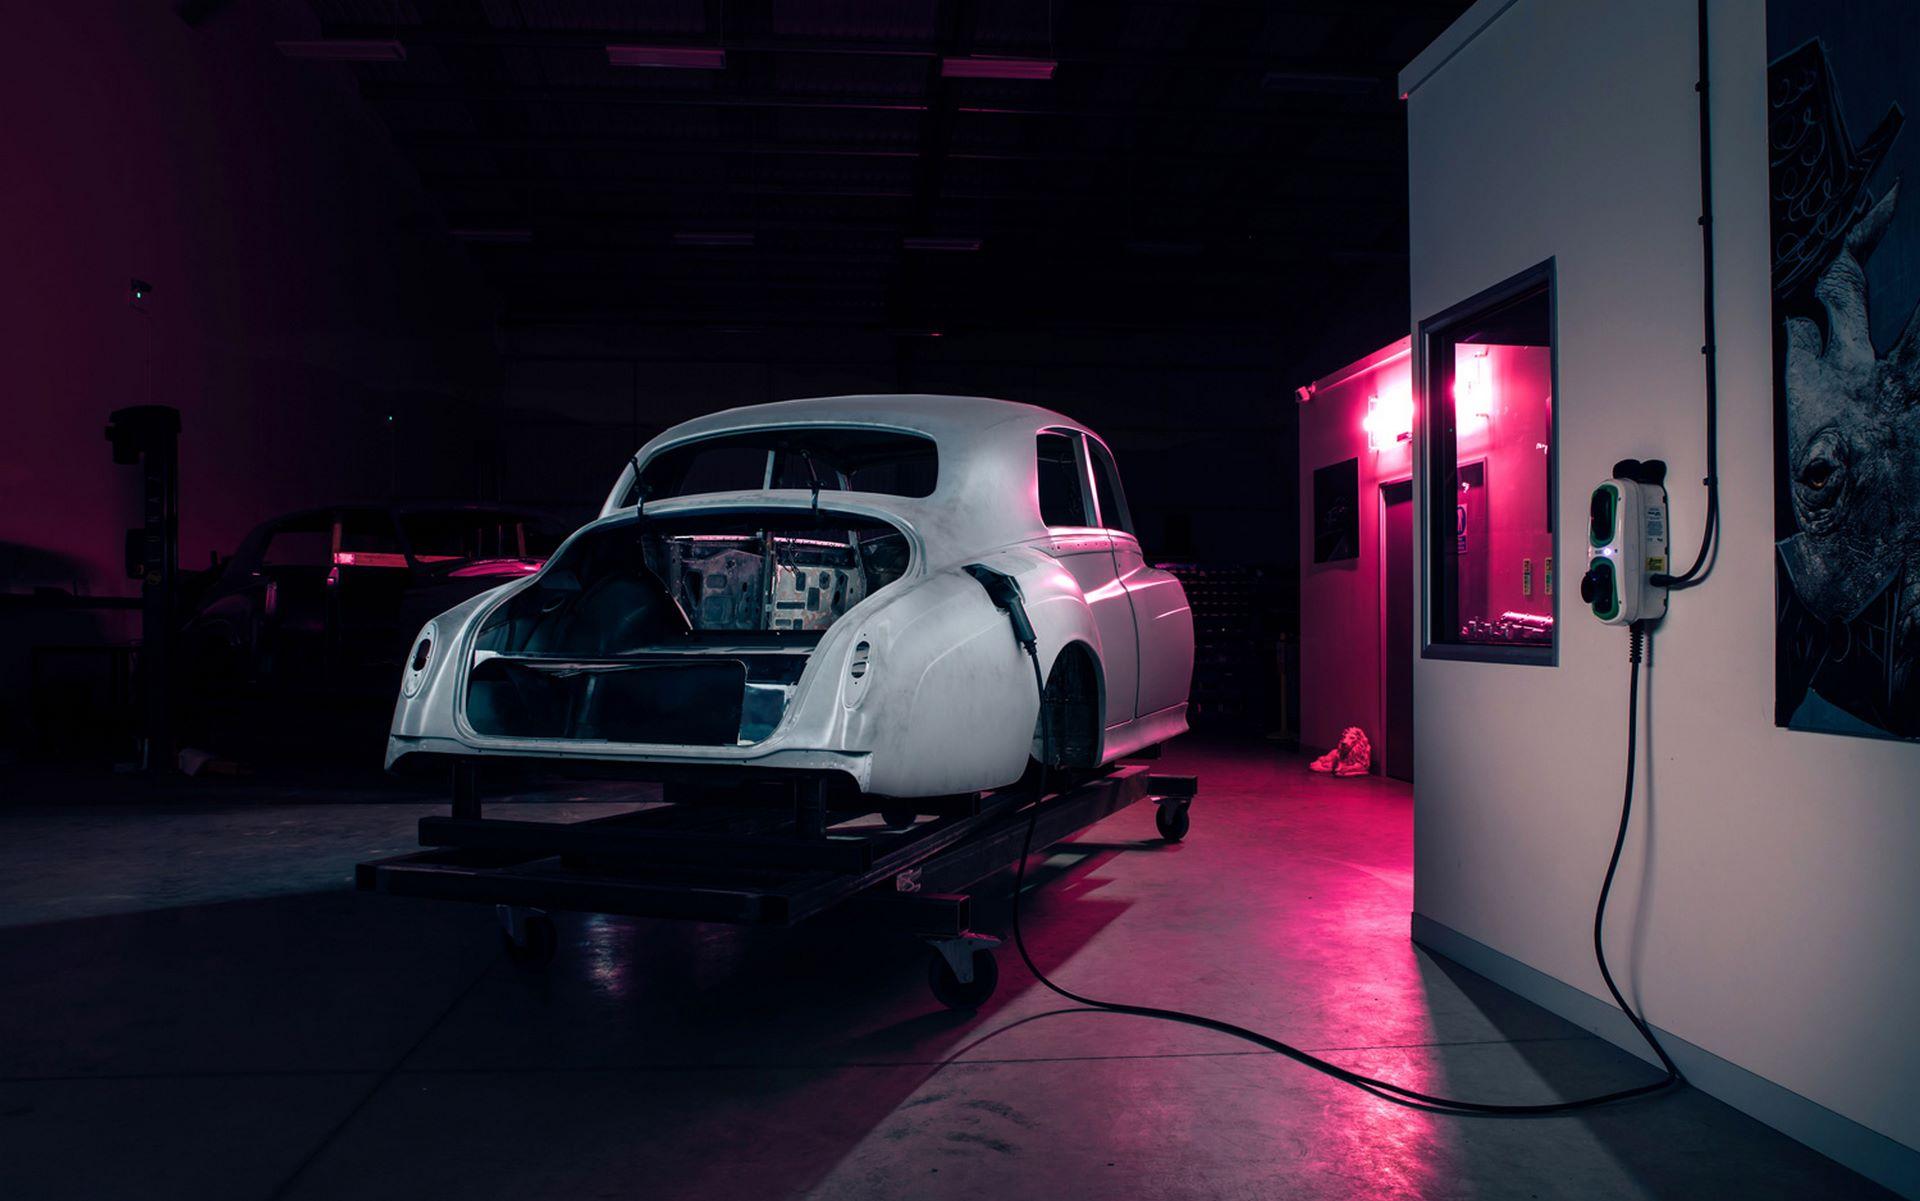 Electris-Rolls-Royce-Phantom-V-and-Silver-Cloud-by-Lunaz-4